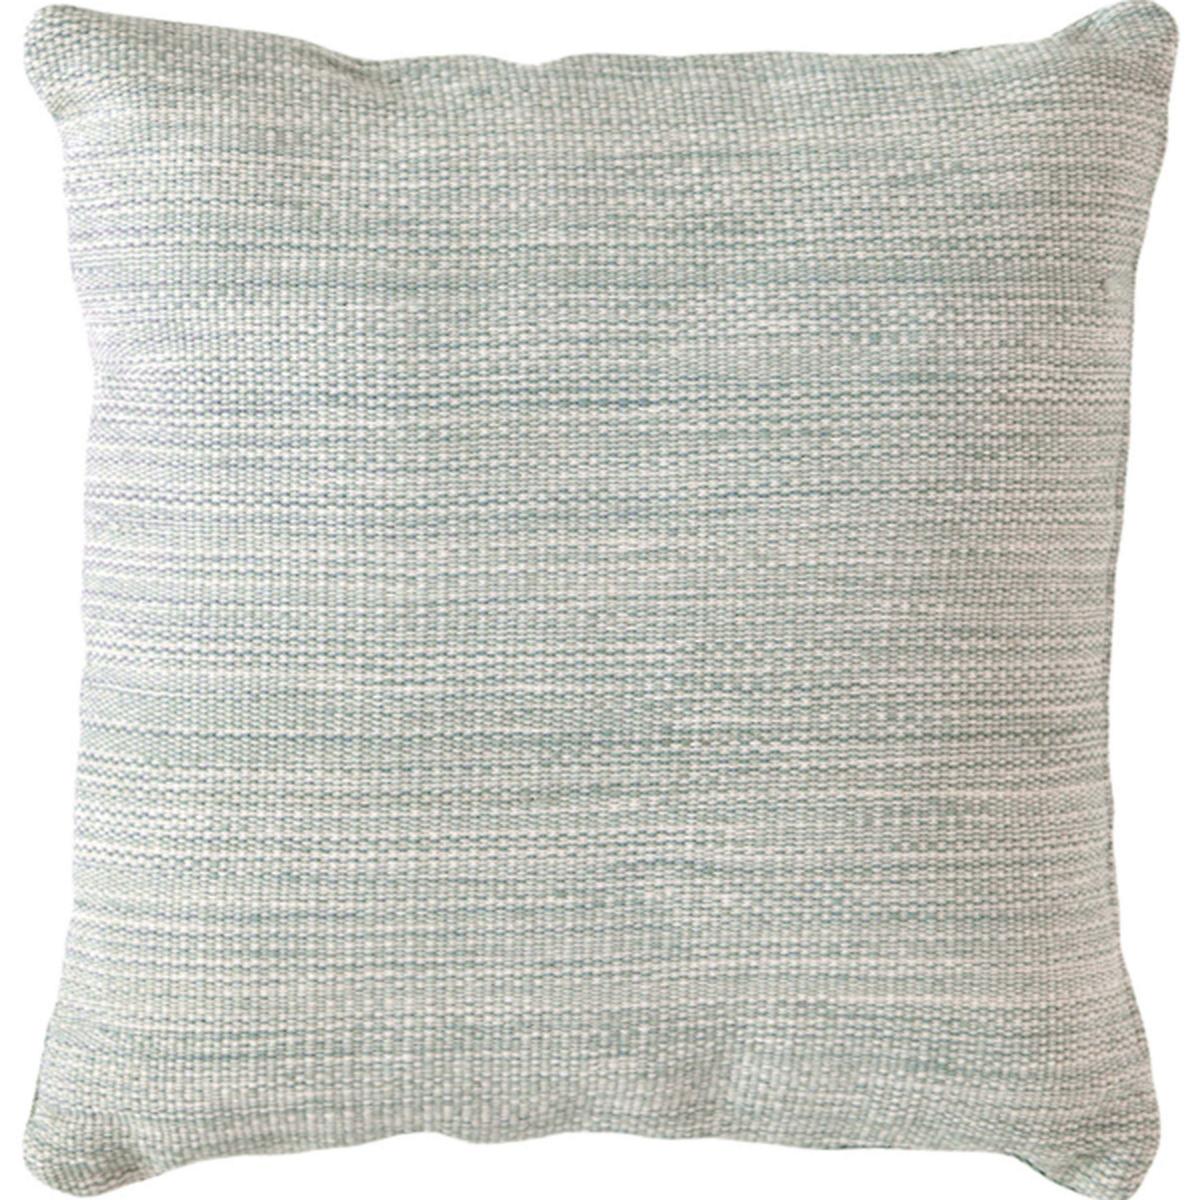 Mingled Light Blue Indoor/Outdoor Pillow   Fresh American